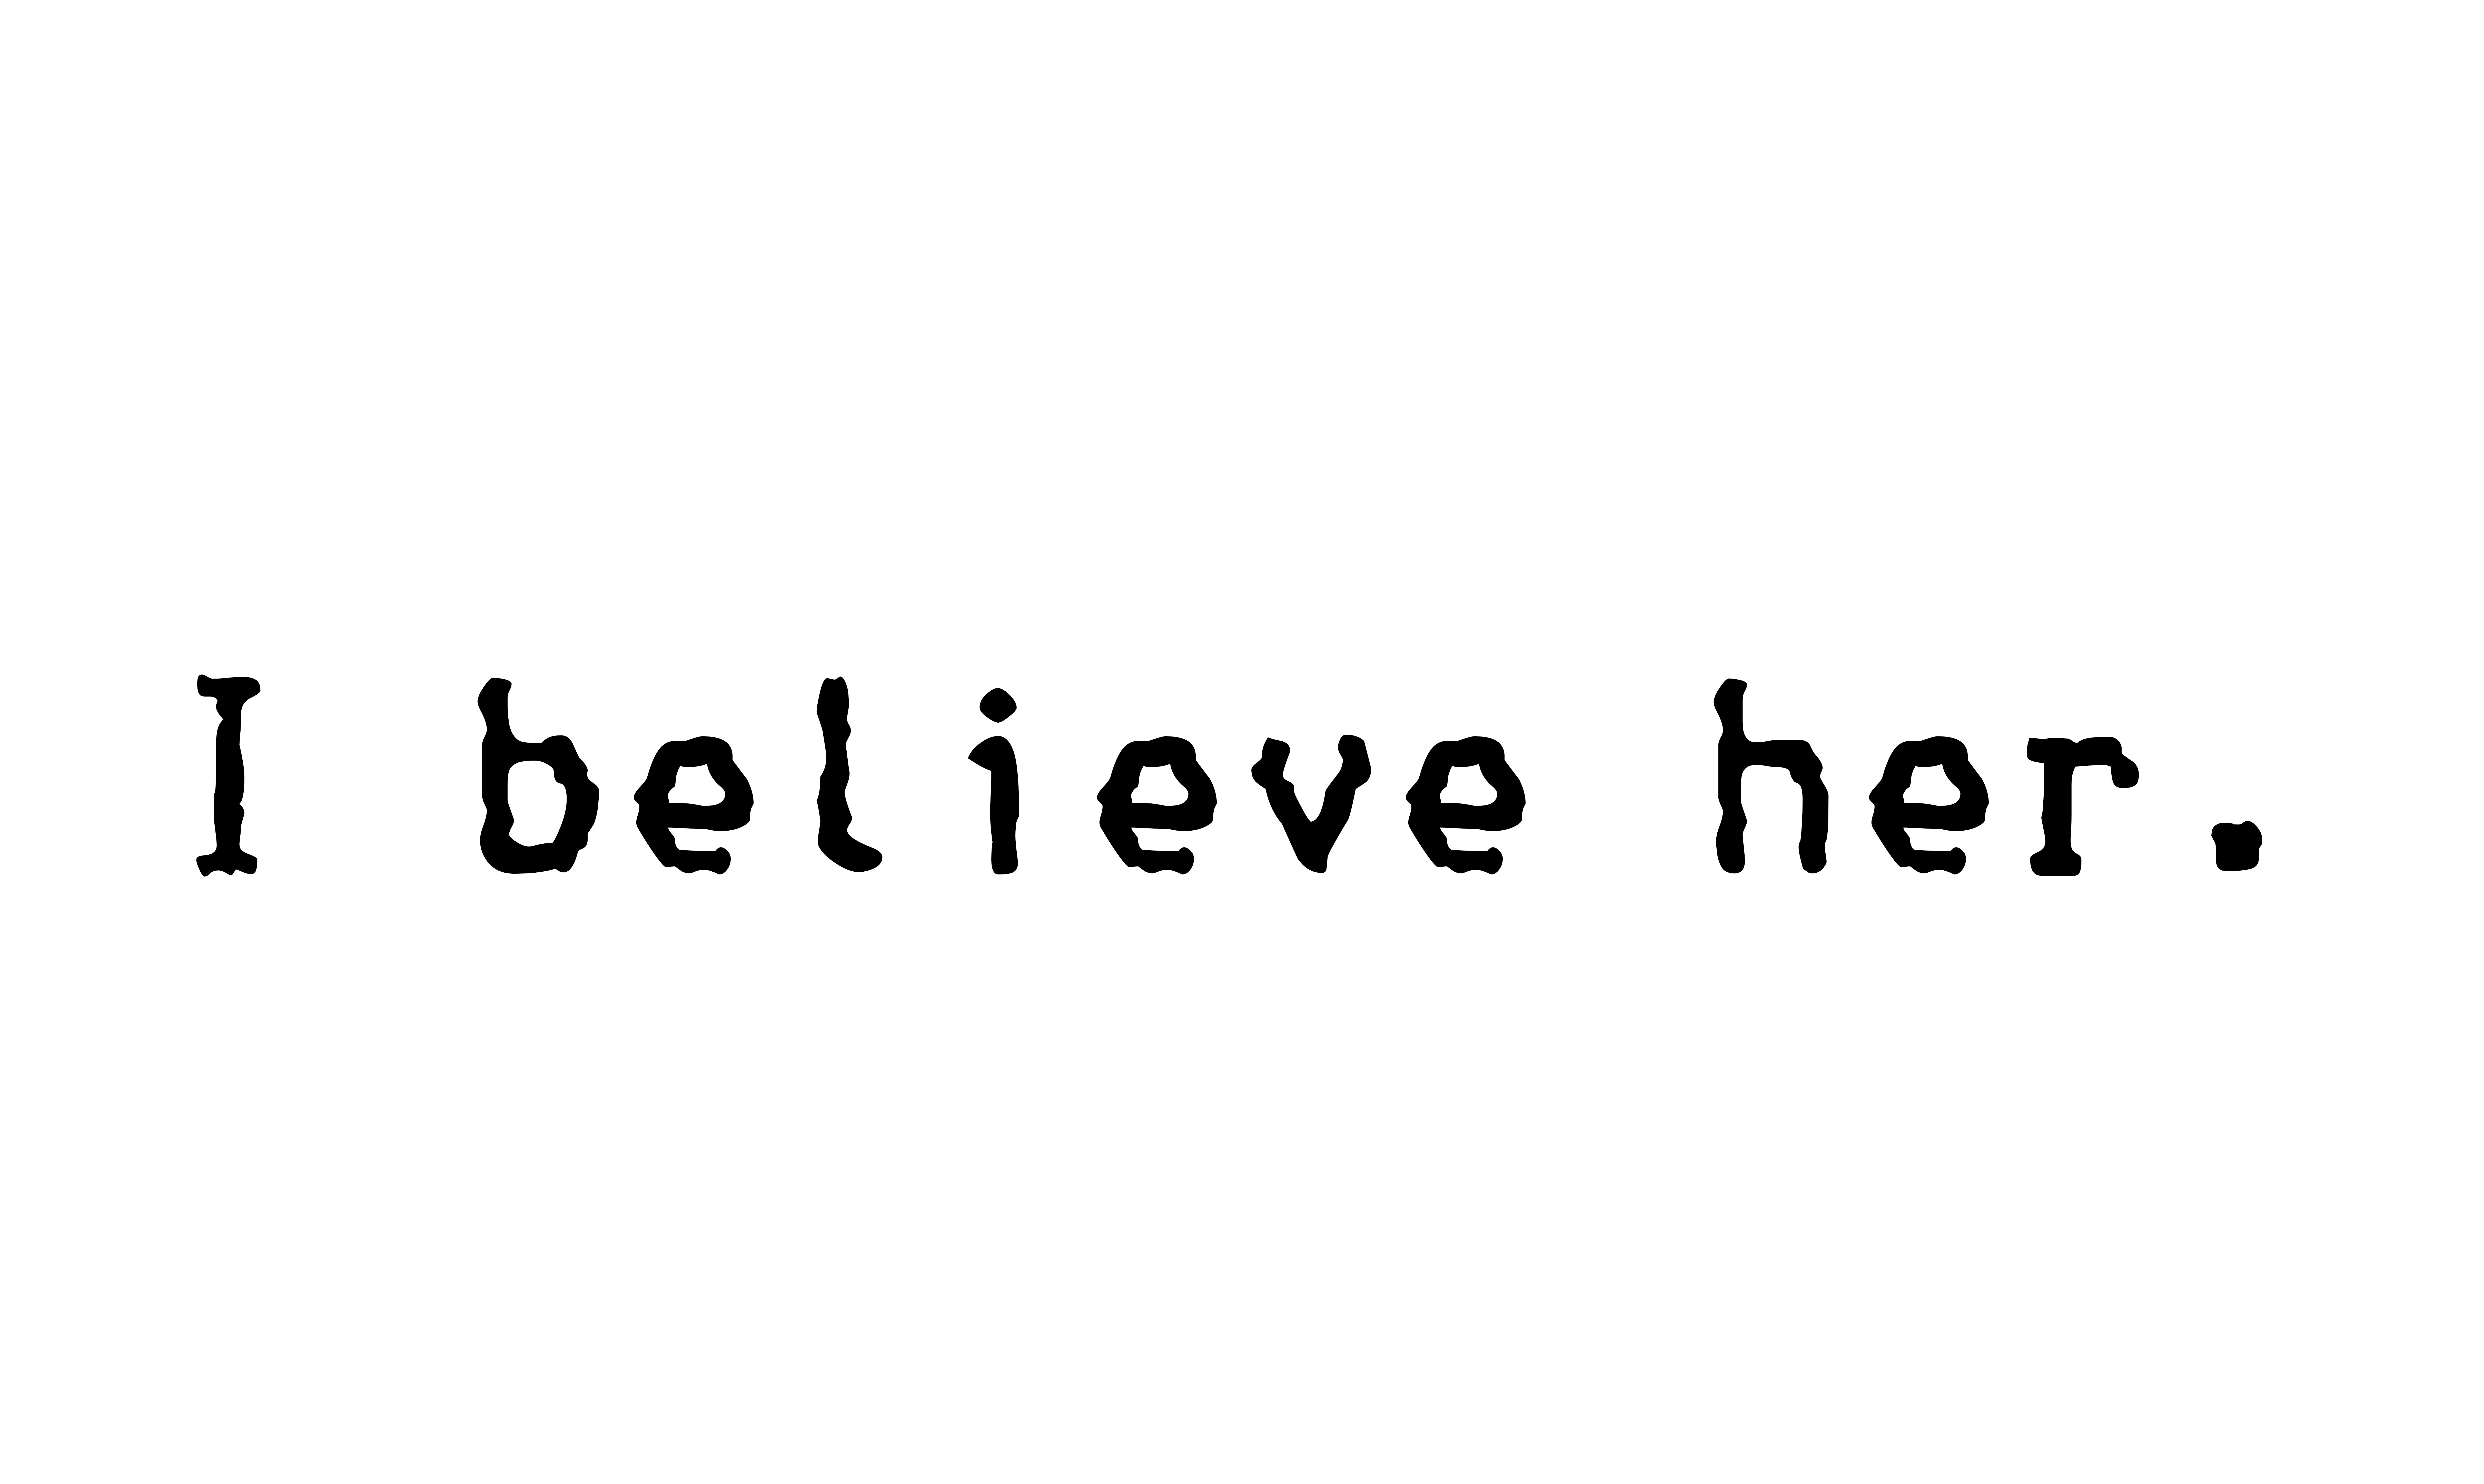 I believe her!